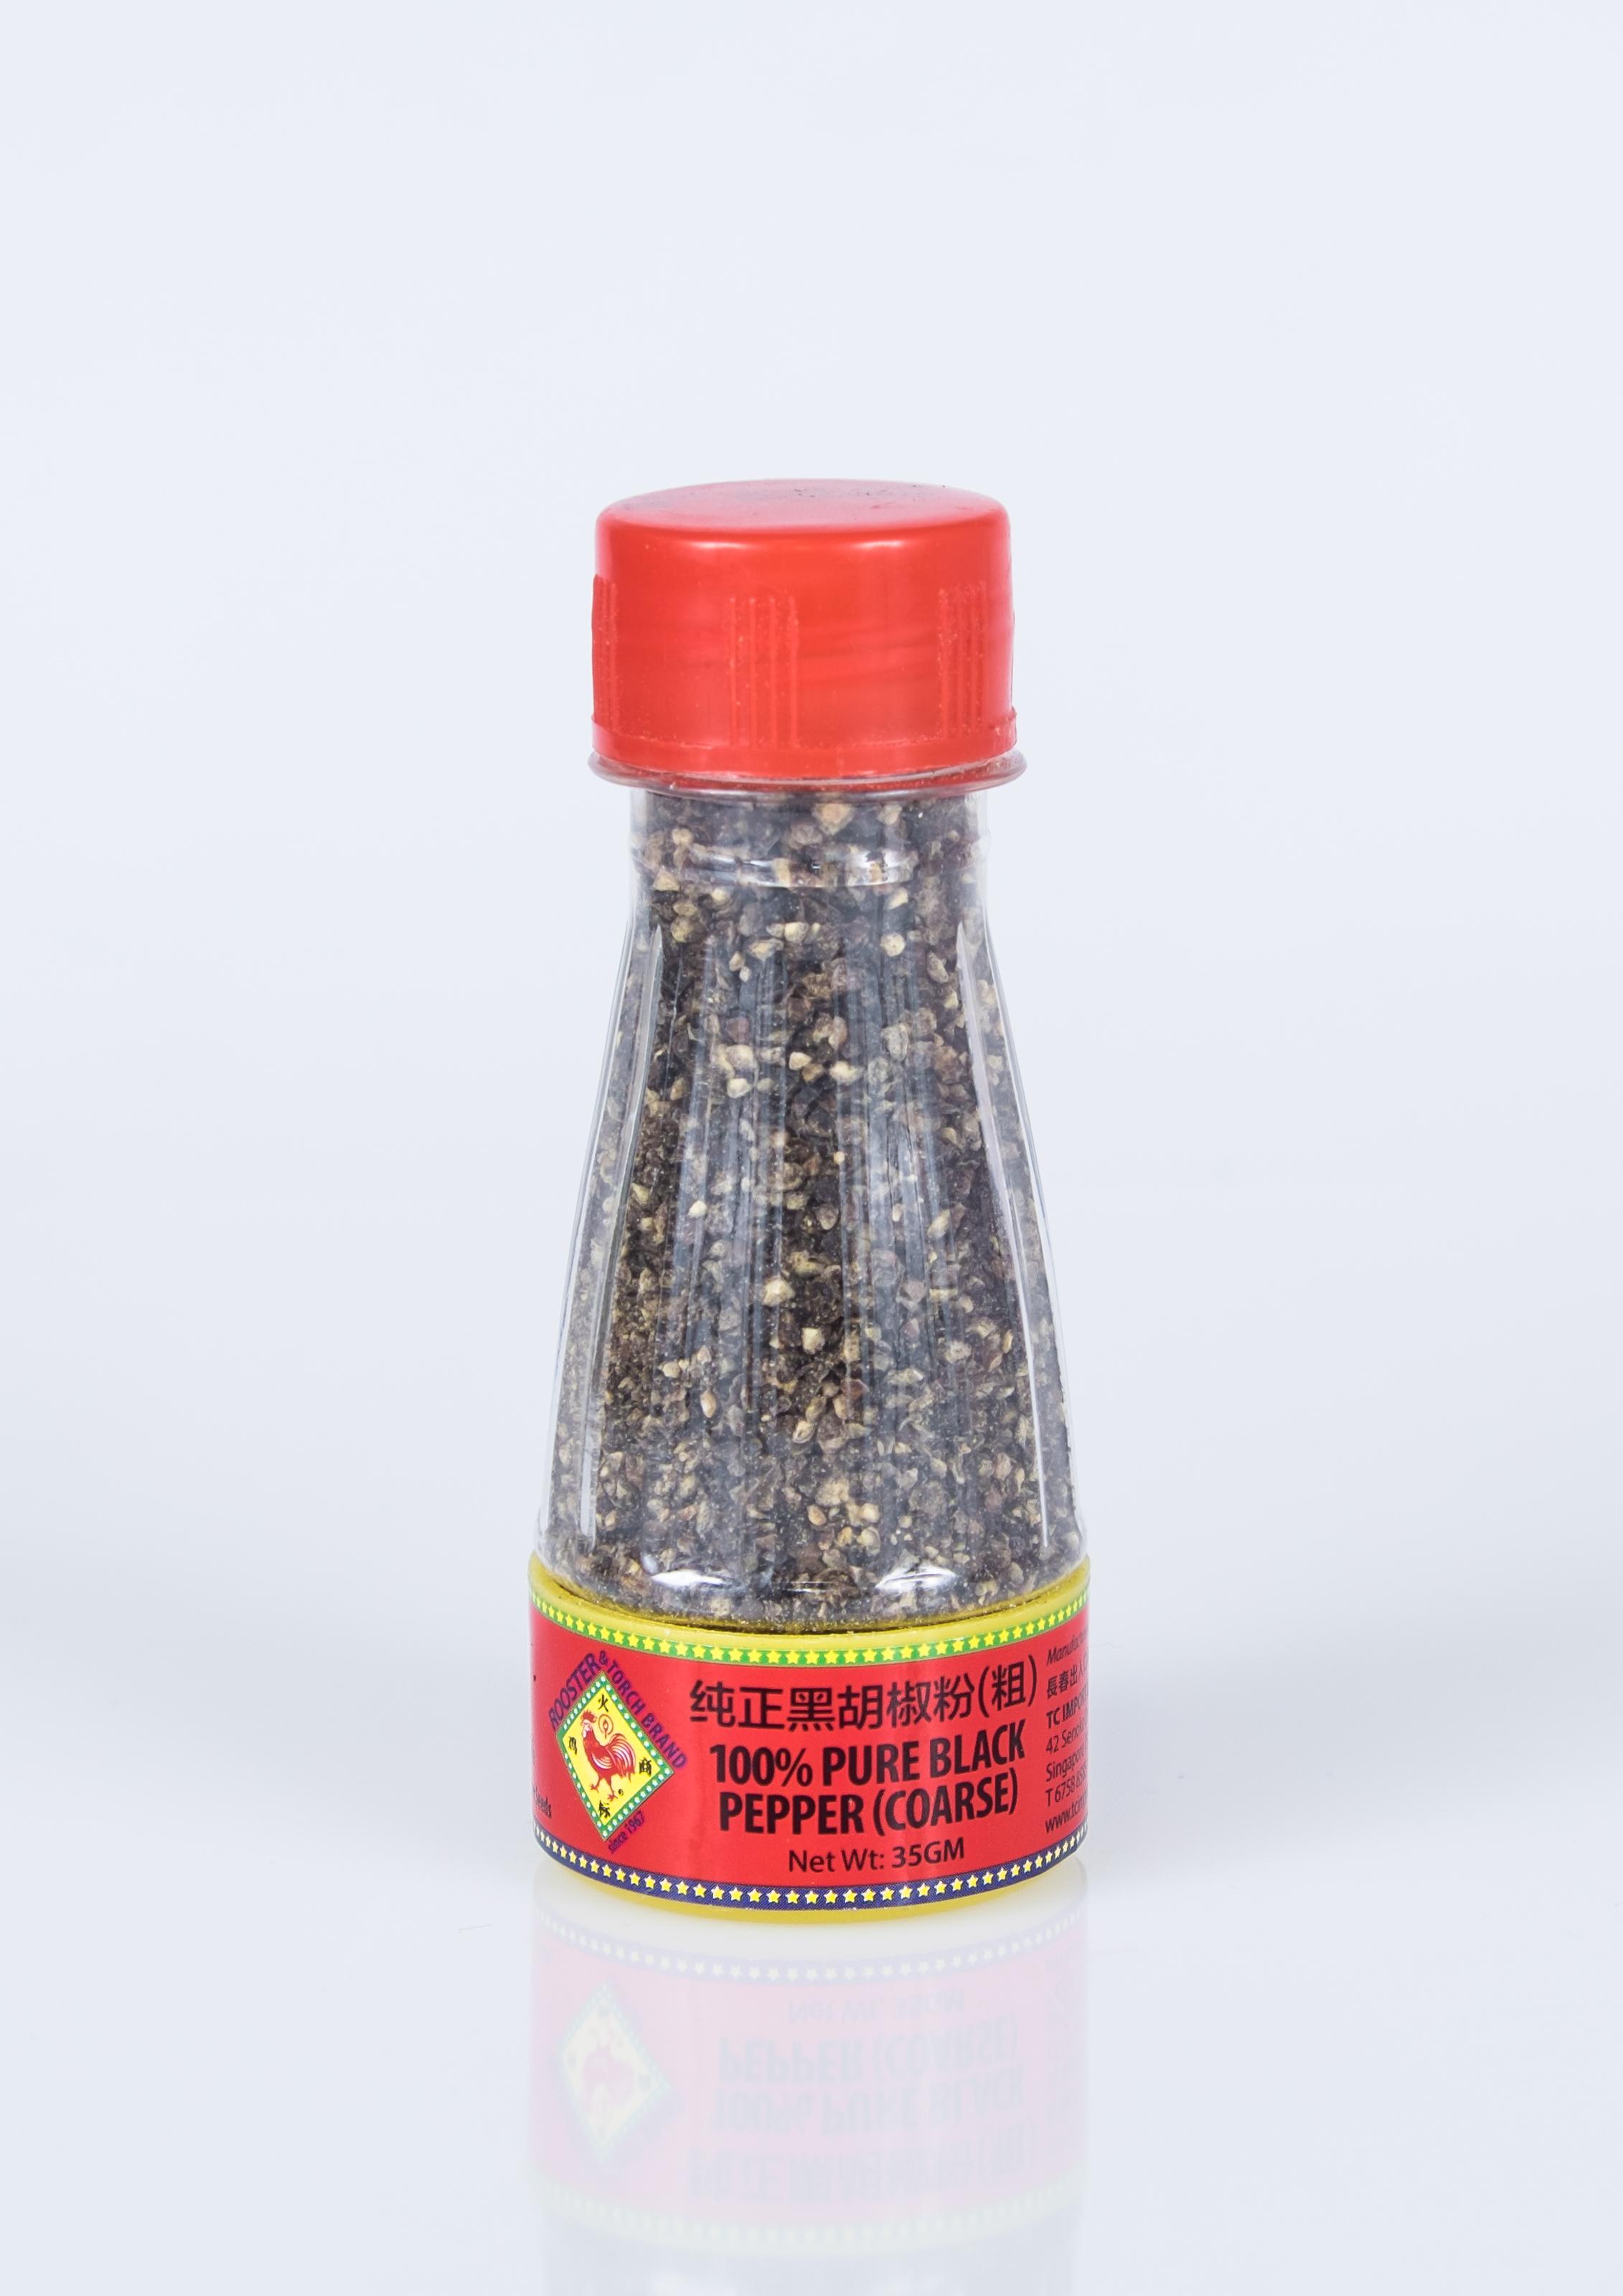 RT Black Pepper Coarse 35g